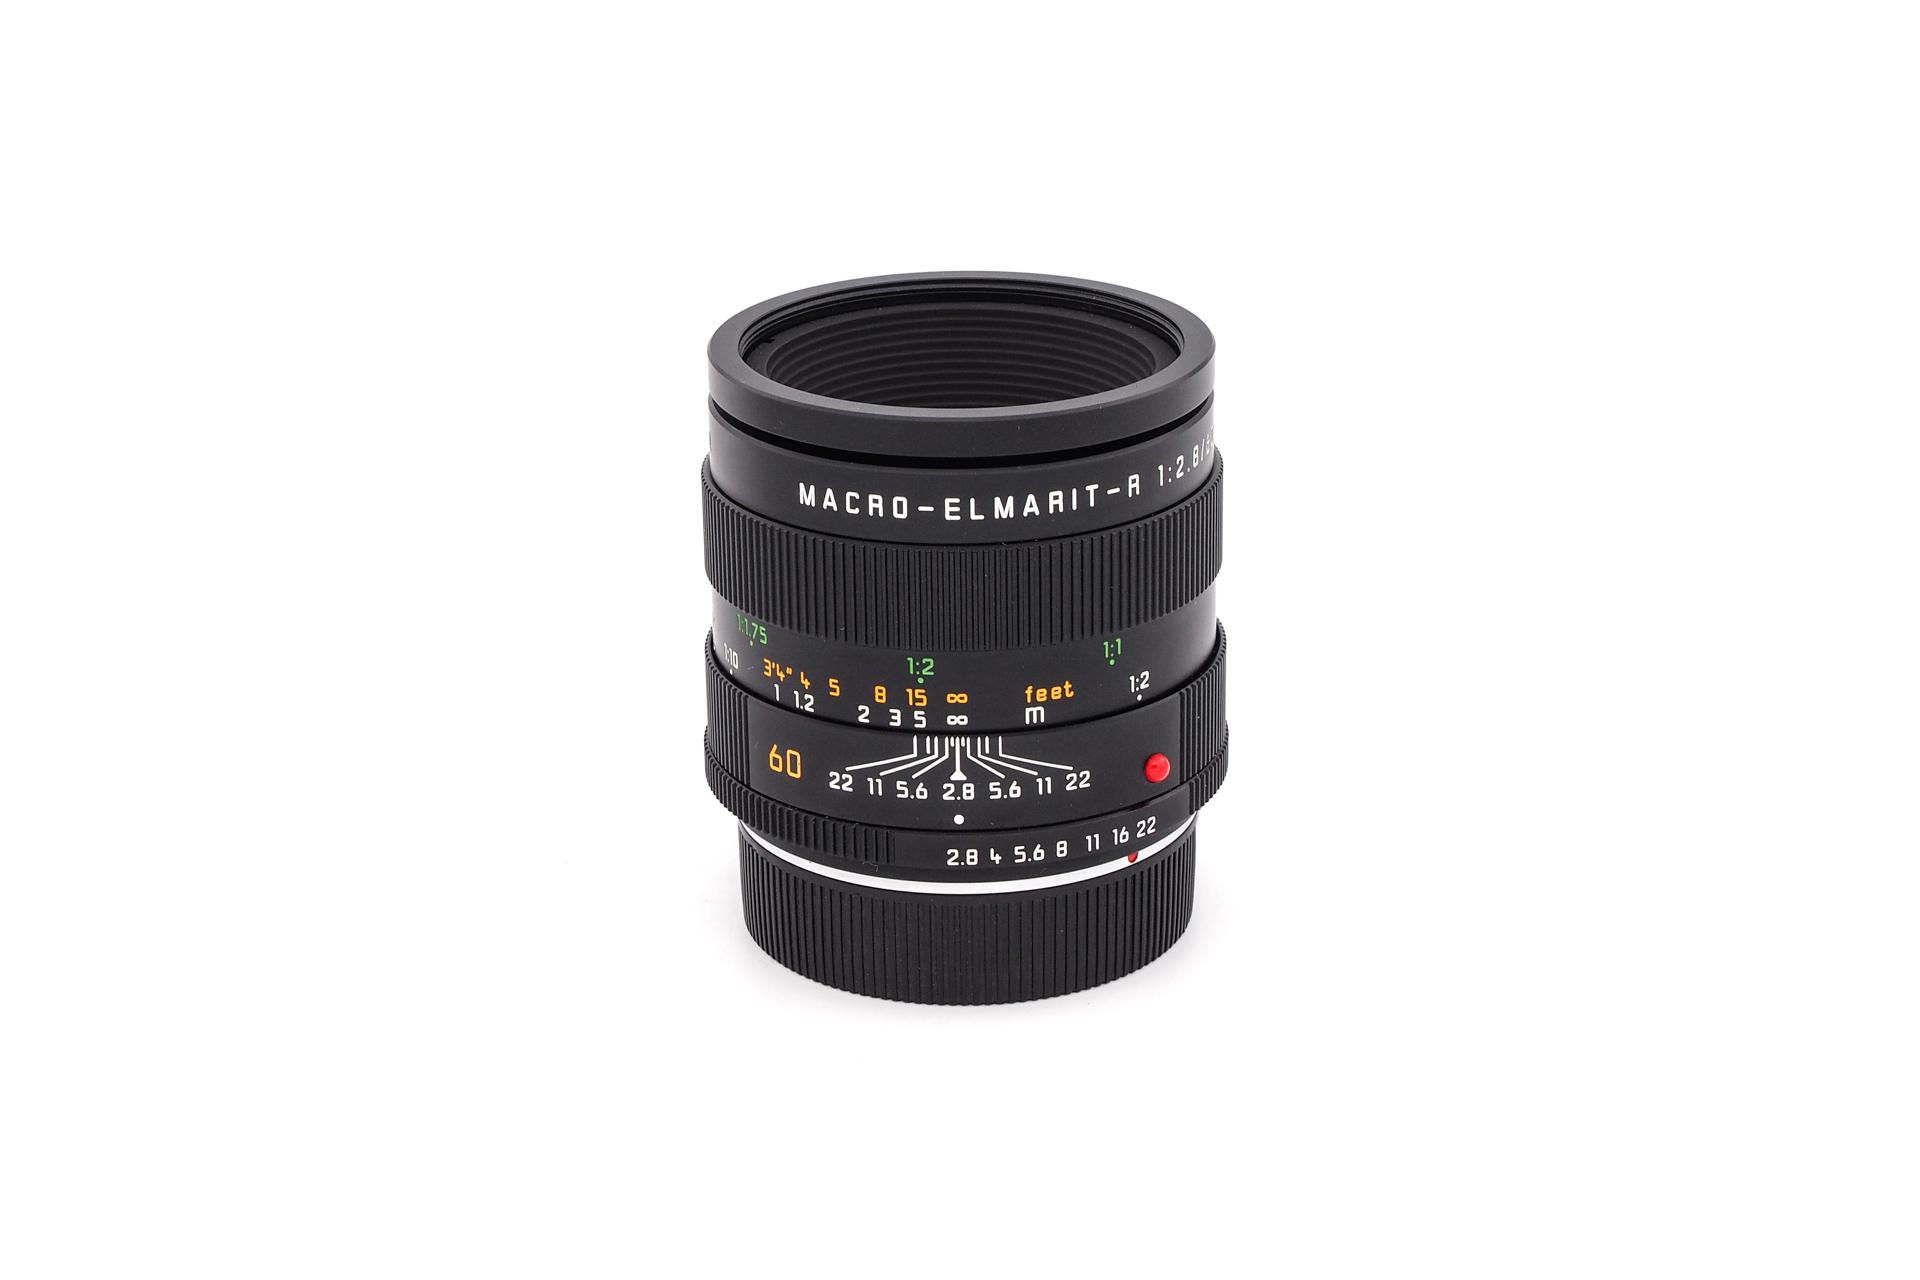 Leica Macro-Elmarit-R 1:2.8/60